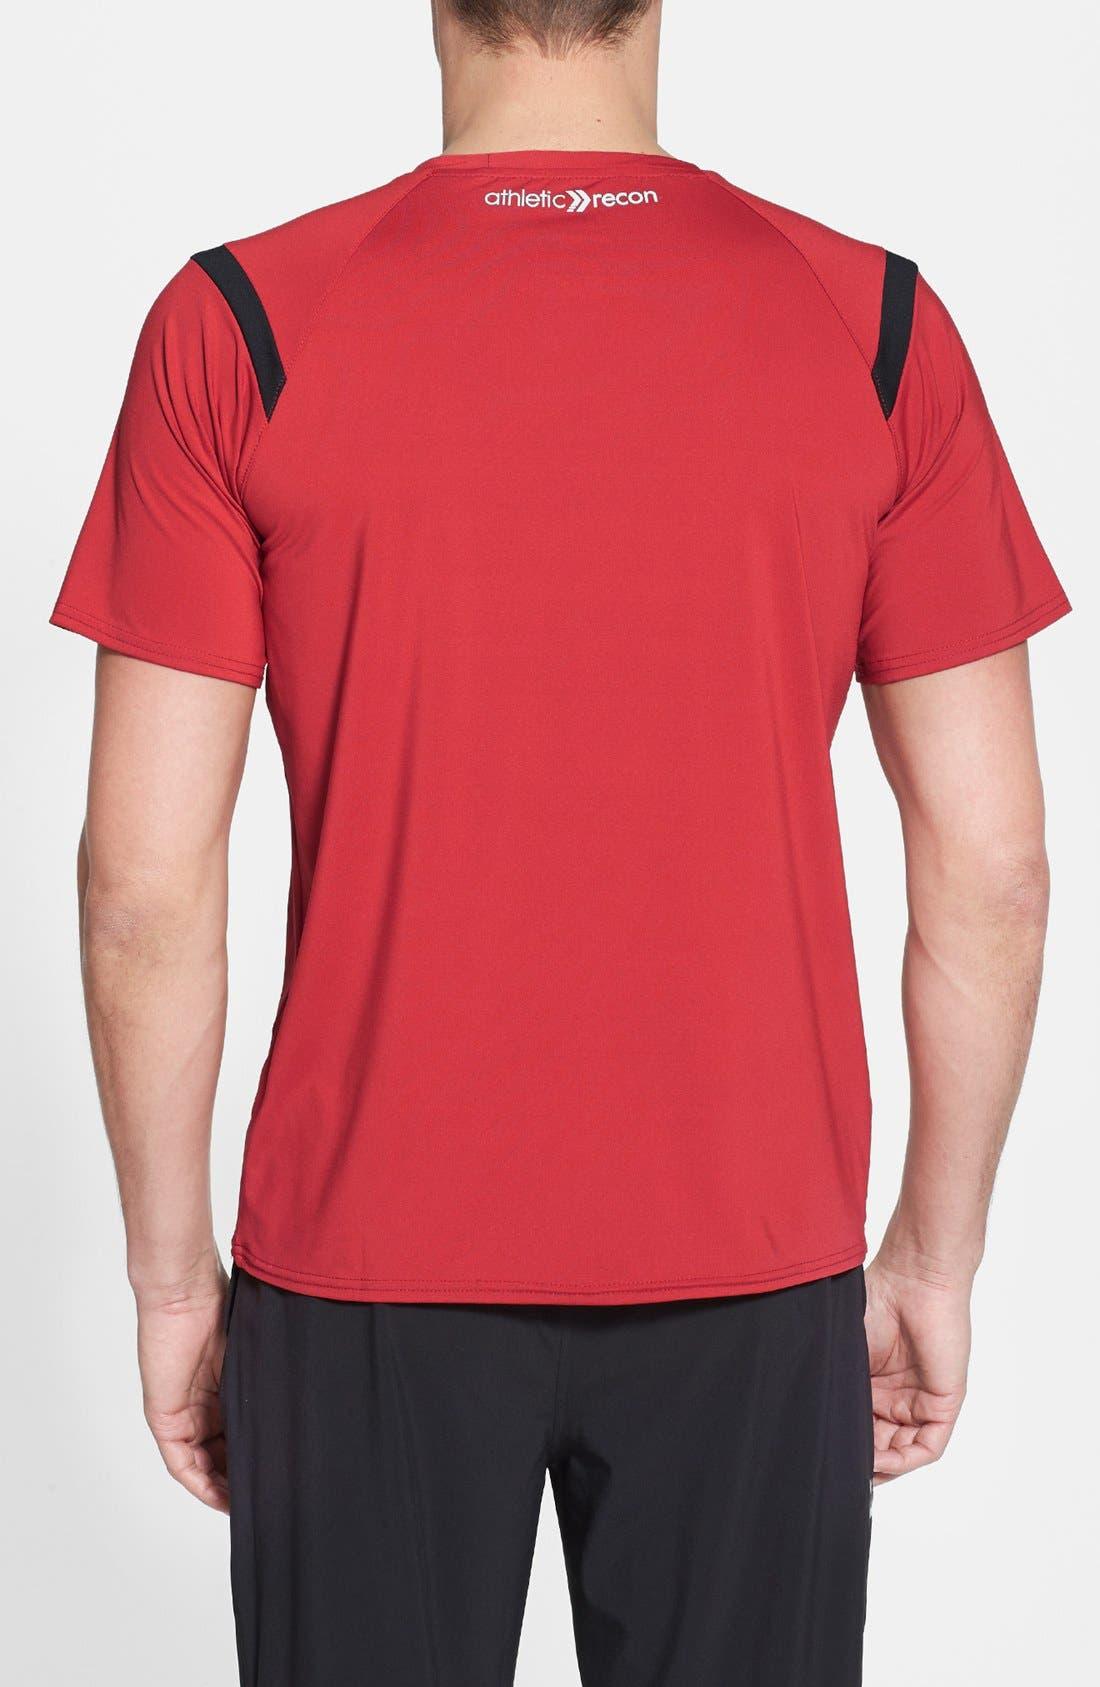 Alternate Image 2  - Athletic Recon 'Python' Performance T-Shirt